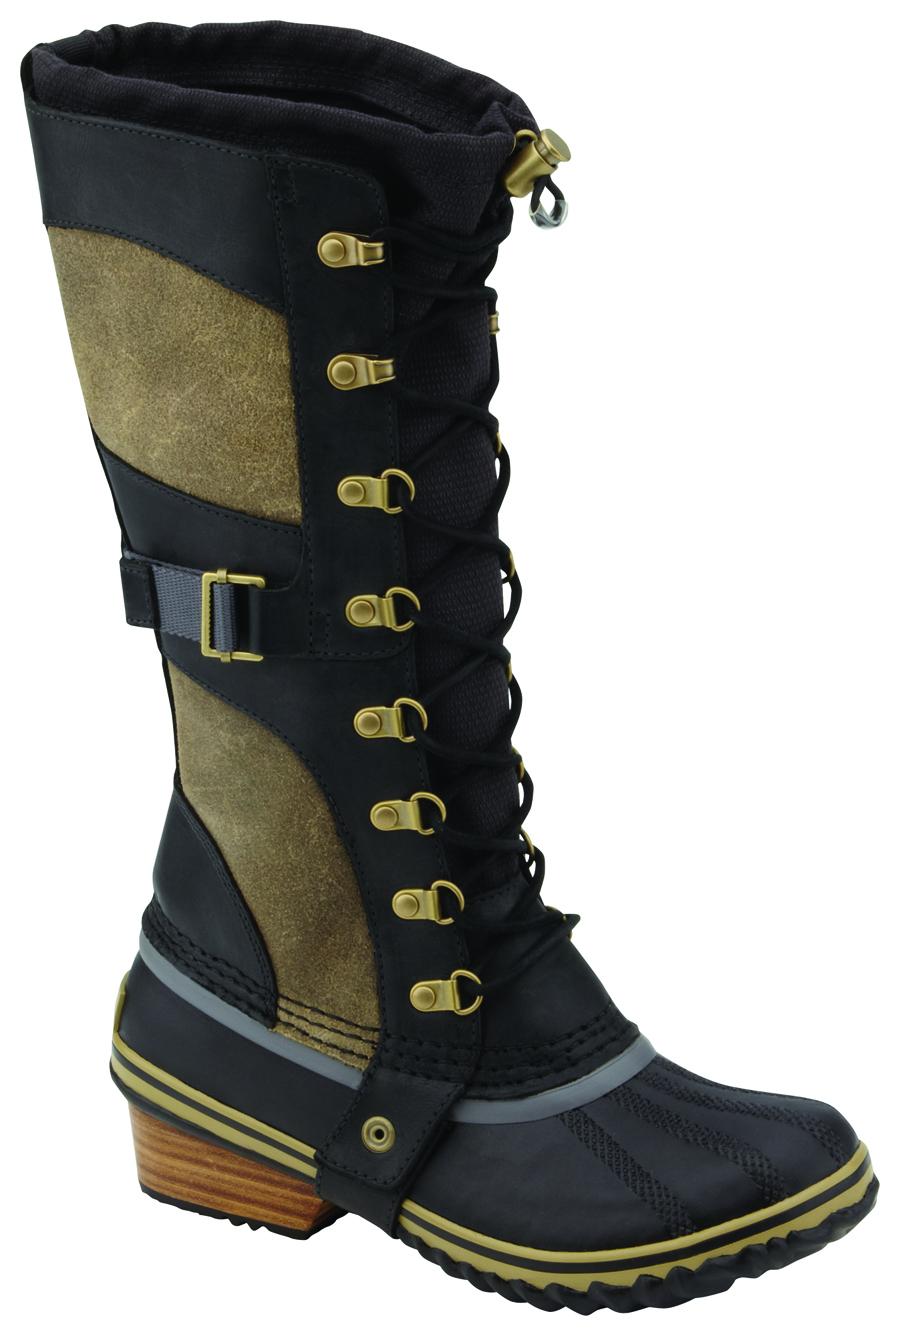 ski fashion 2012 2013 stylish winter boots for women and